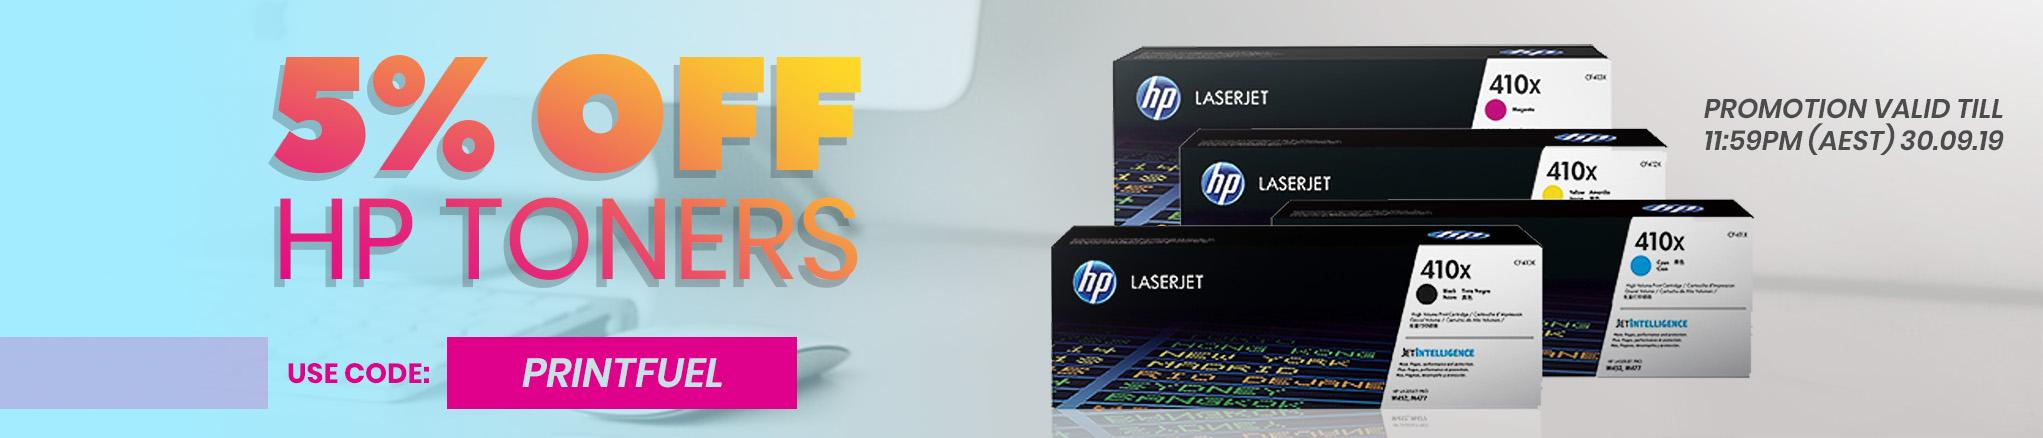 5% off all HP toners - use code PRINTFUEL